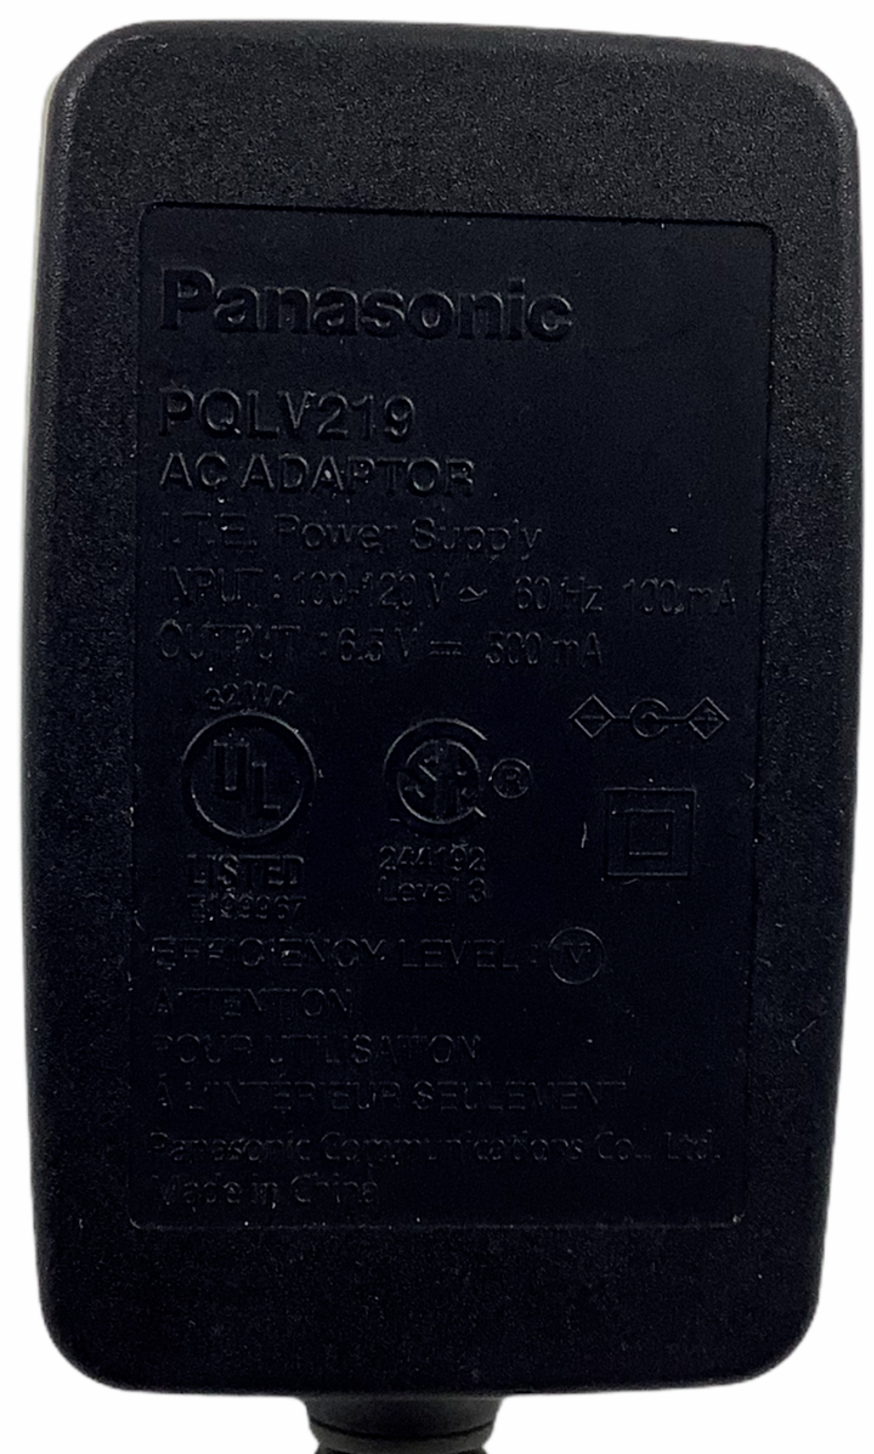 Genuine Panasonic AC Power Supply Adapter - PQLV219 Output: 6.5V 500mA